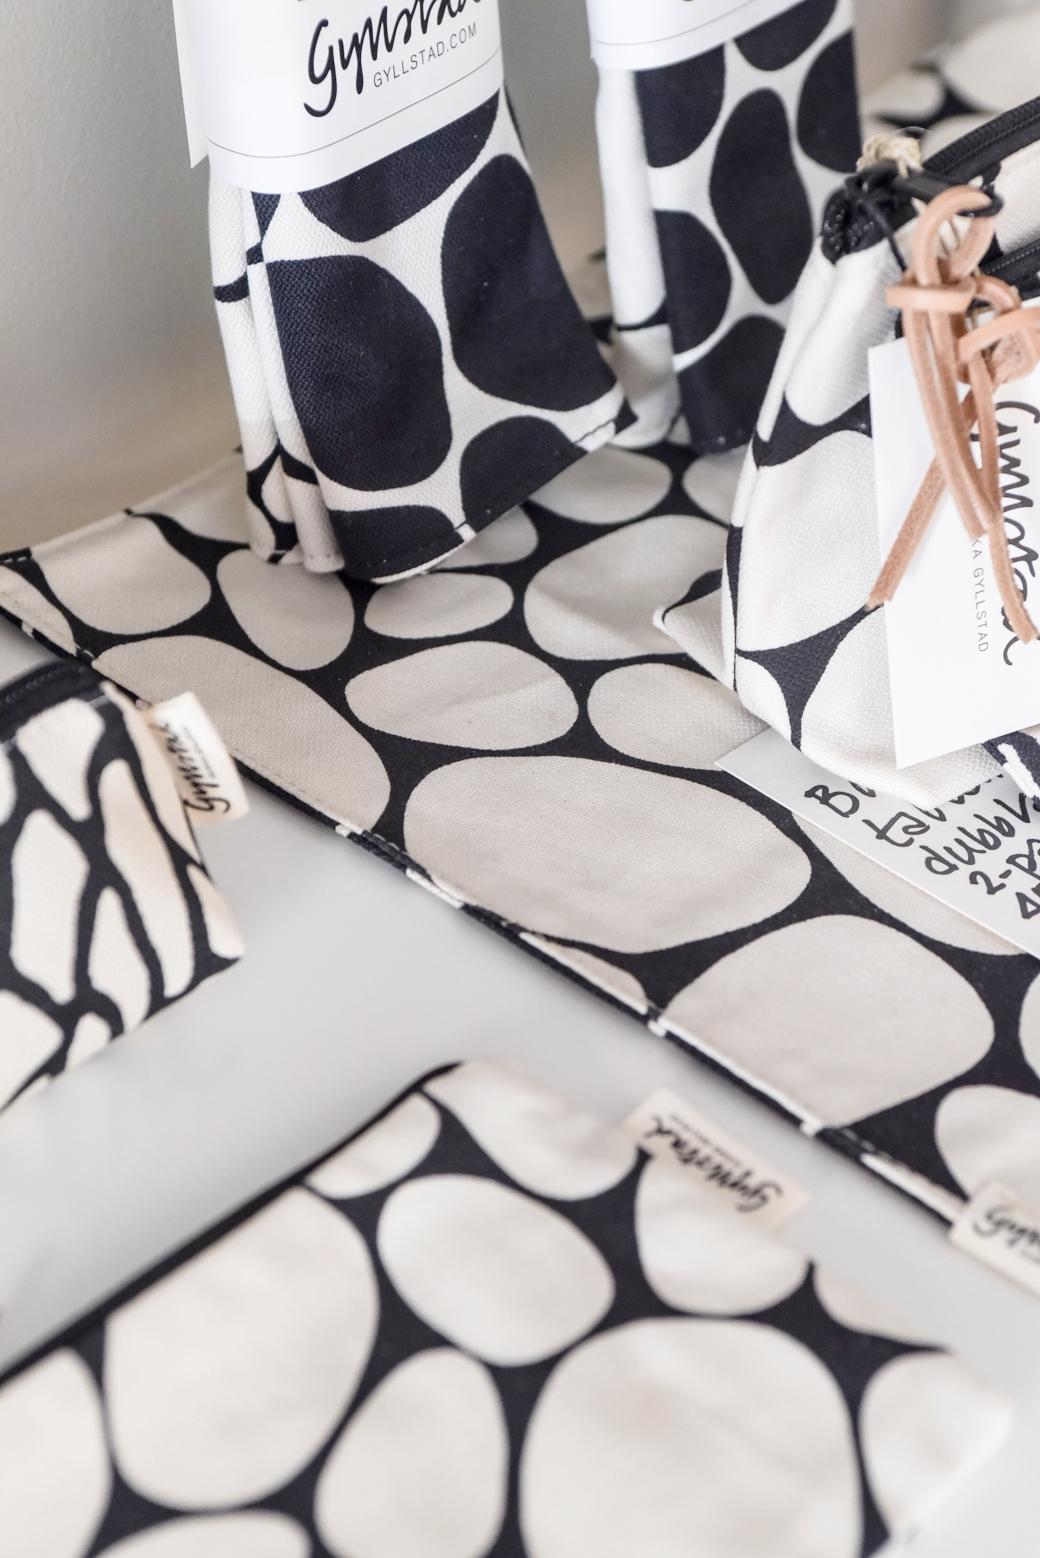 Tour The Studio of Swedish Textile Designer Ulrika Gyllstad